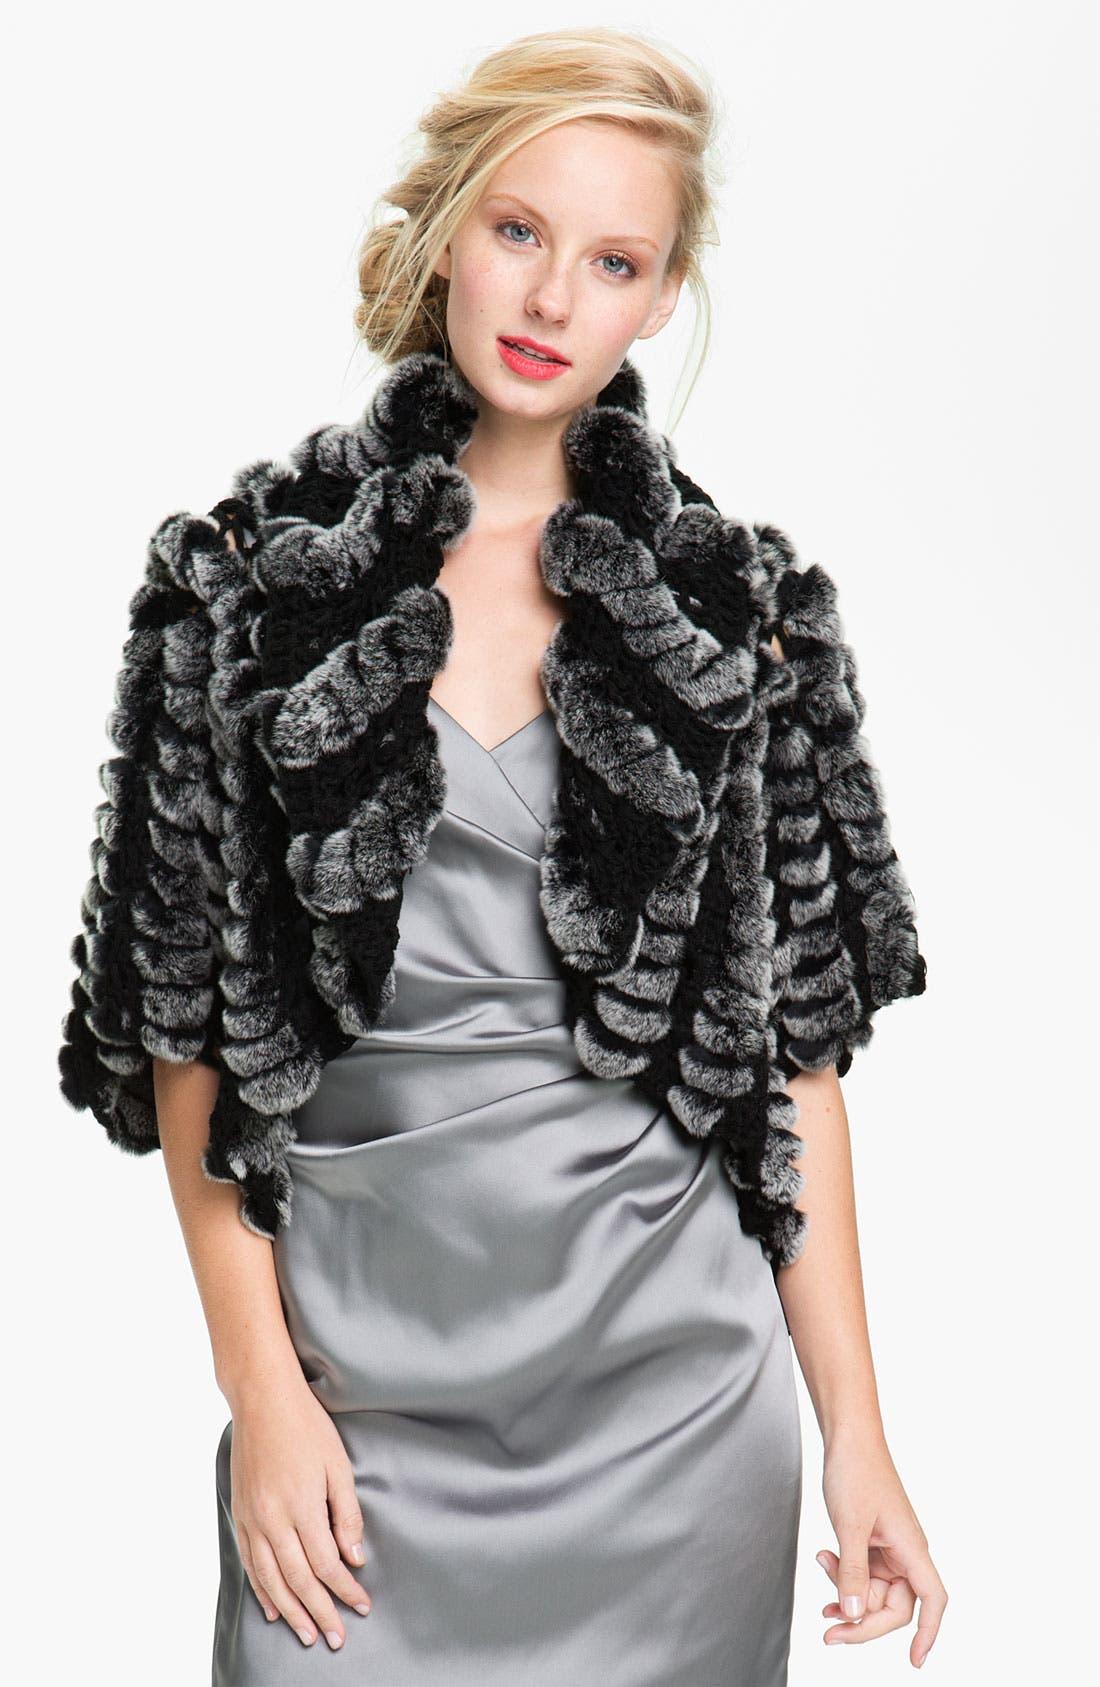 Alternate Image 1 Selected - Alexia Admor Crochet & Genuine Rabbit Fur Capelet